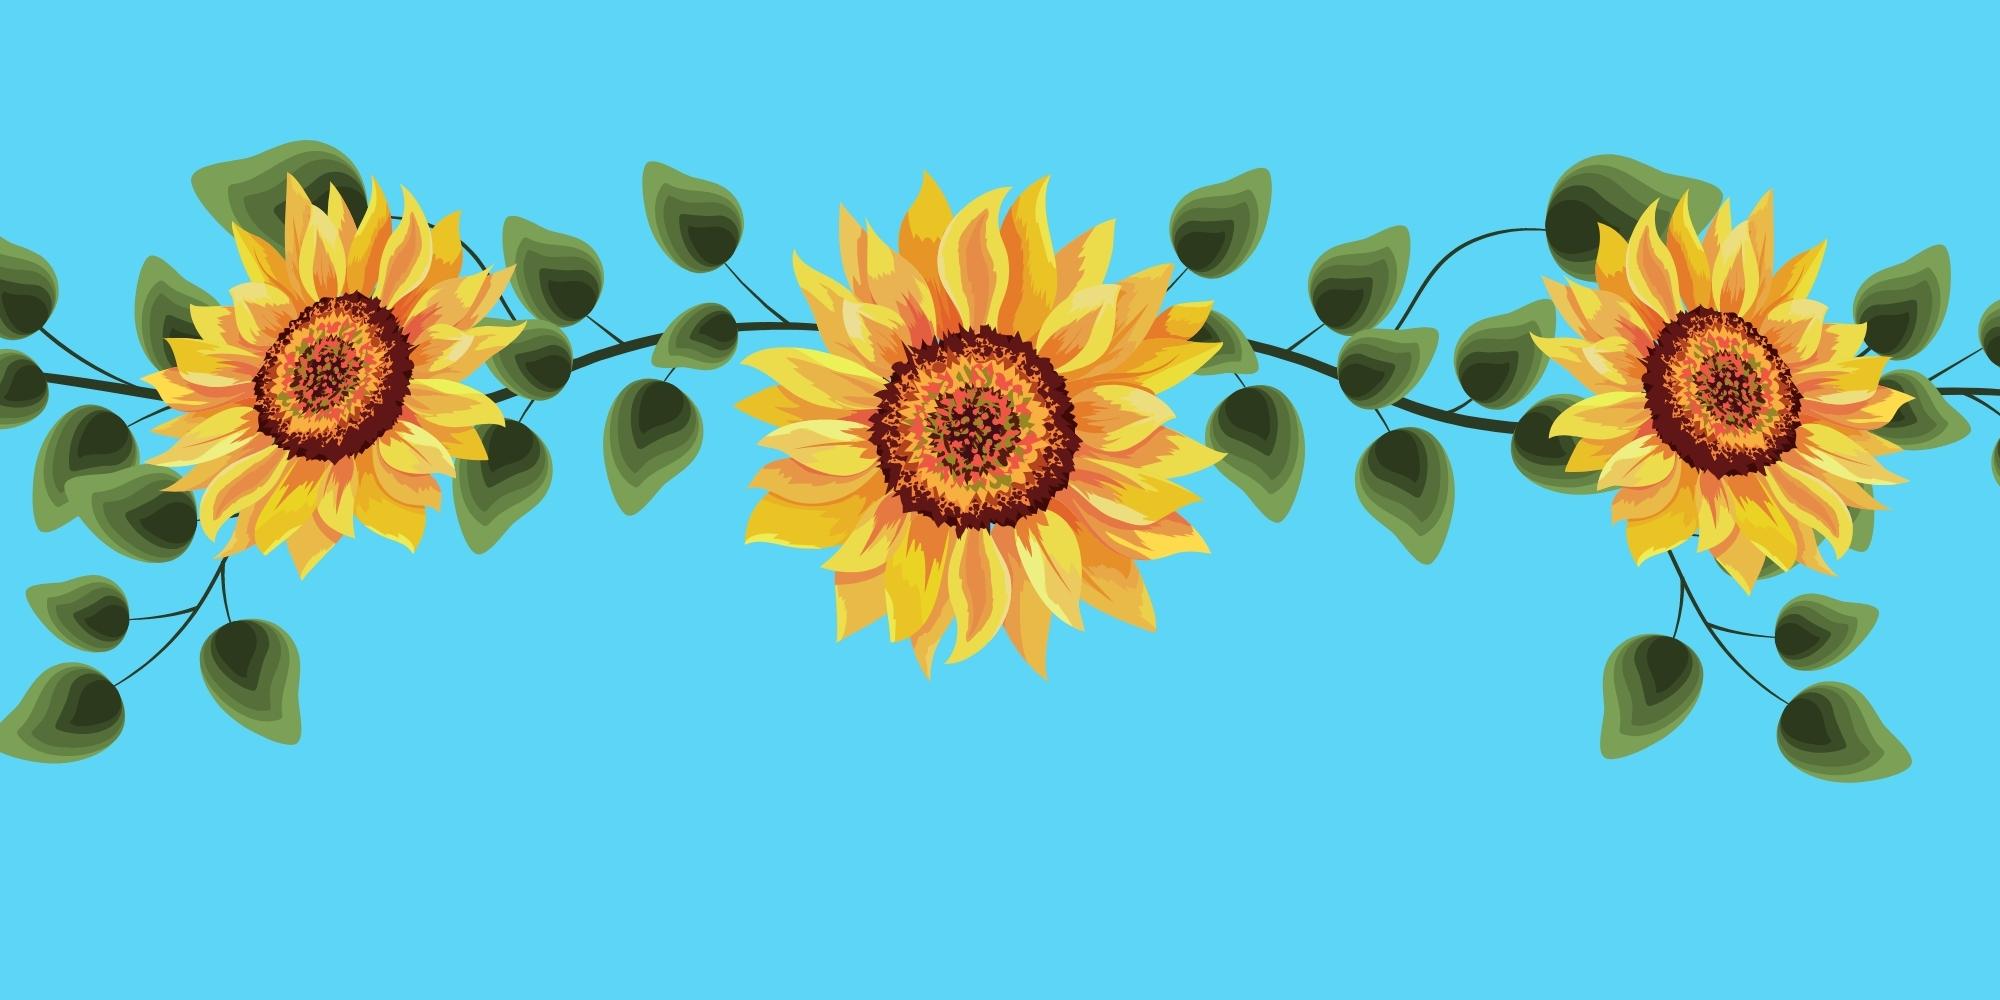 Grab & Go Activity Kit: Sunflower Craft (For Children Ages 2-5)